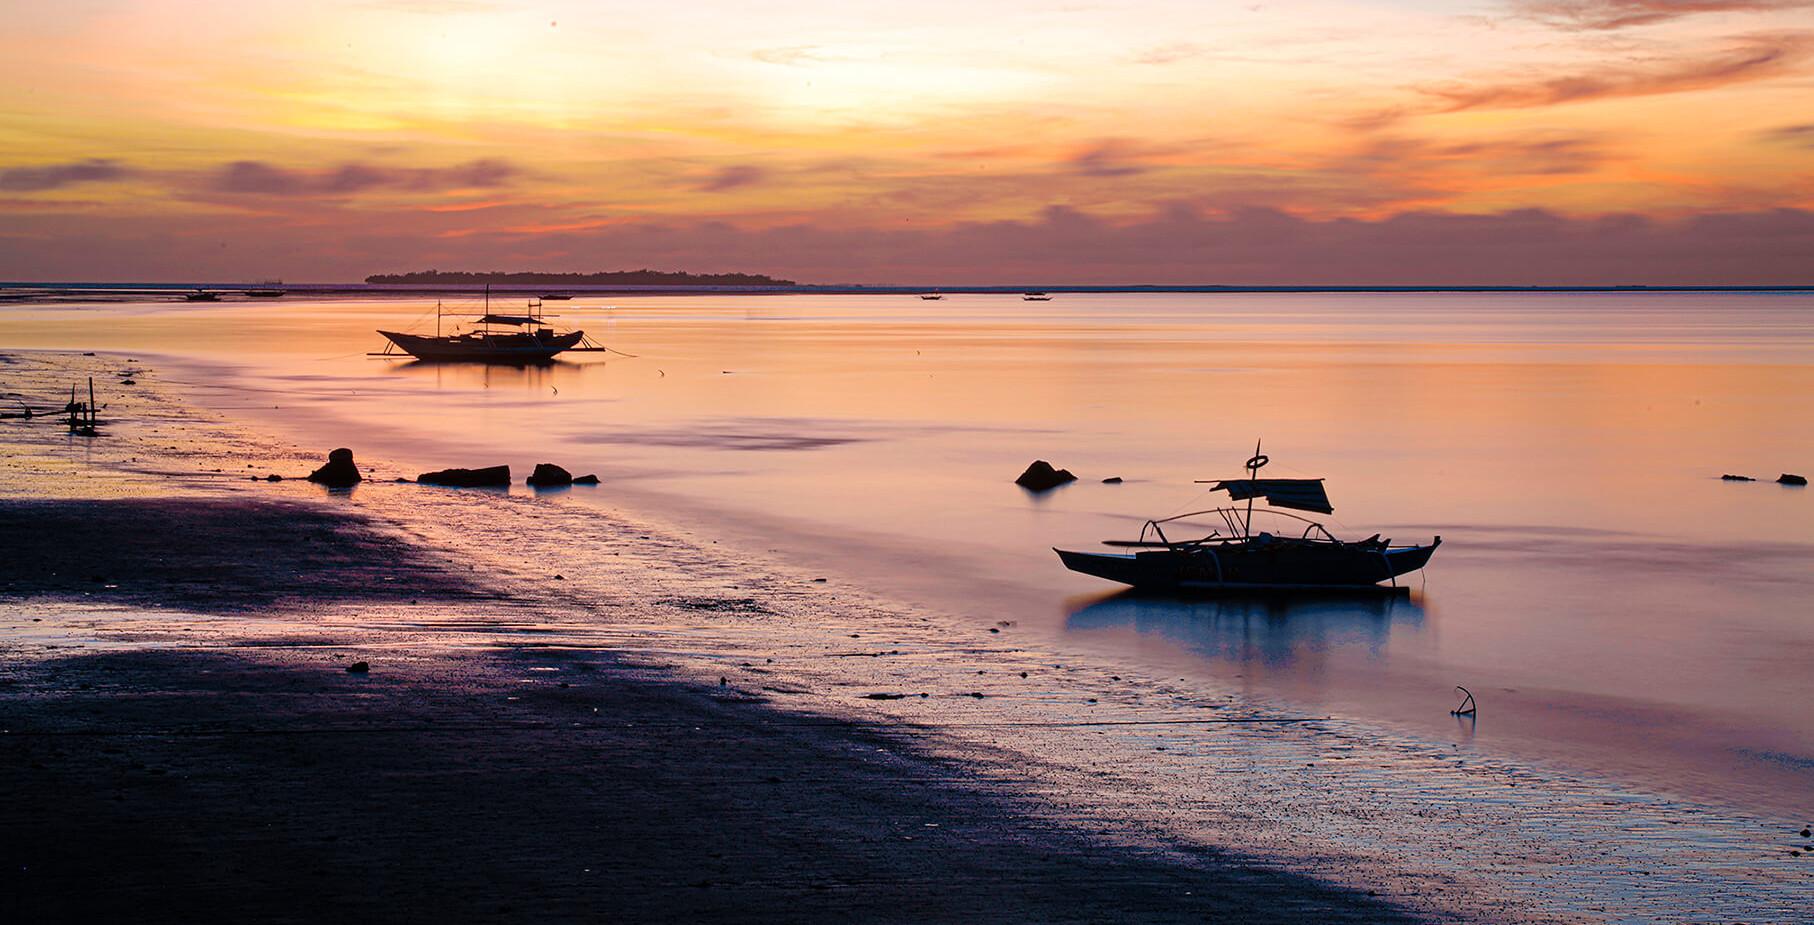 The Philippines - Roxas